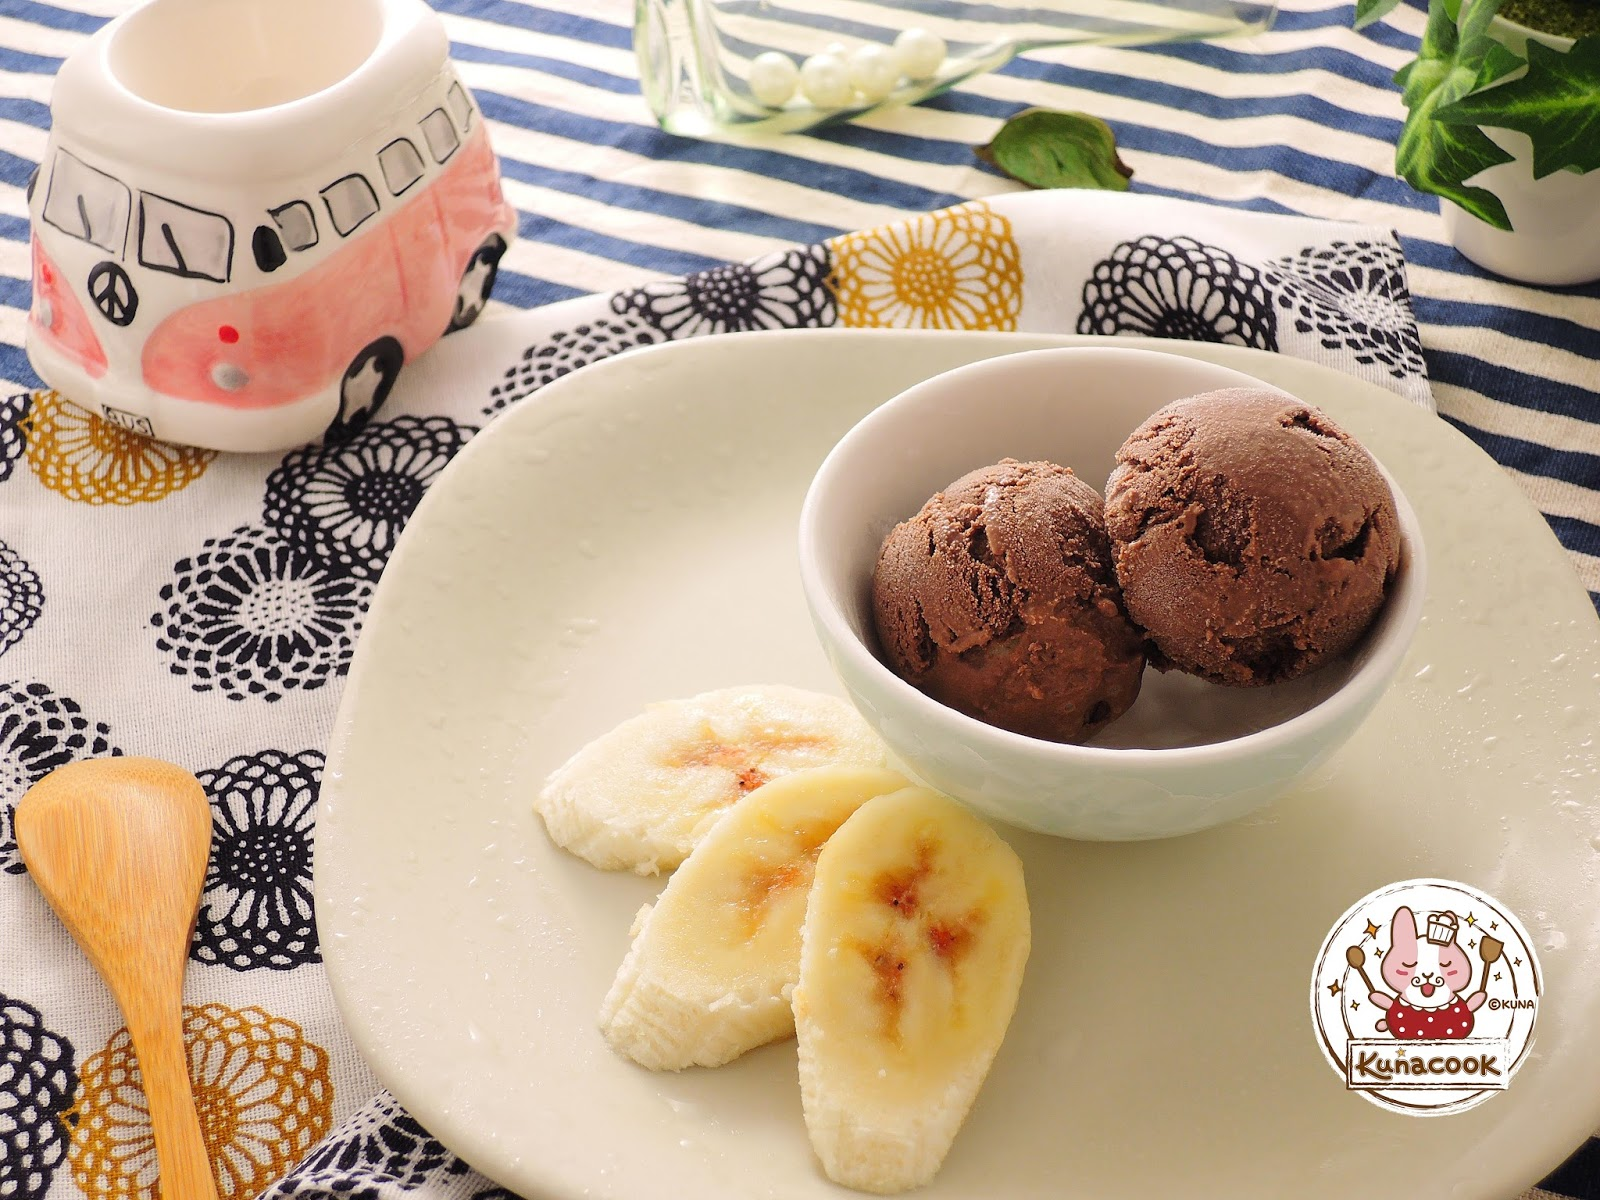 香蕉巧克力手工冰淇淋 homemade chocolate banana ice cream